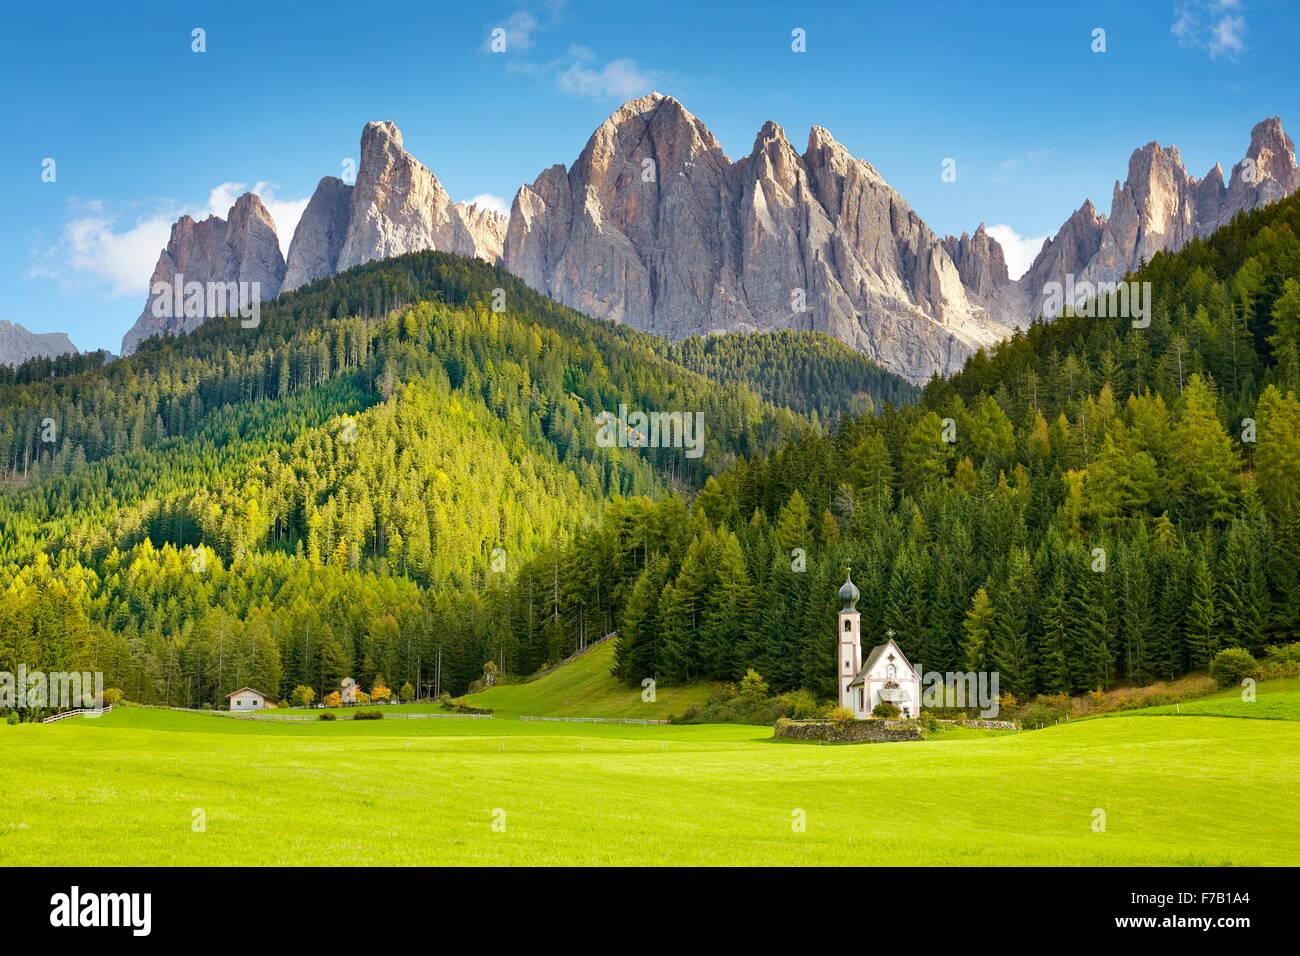 St Johann, Église Santa Maddalena, Tyrol, paysage des Dolomites, Italie Photo Stock